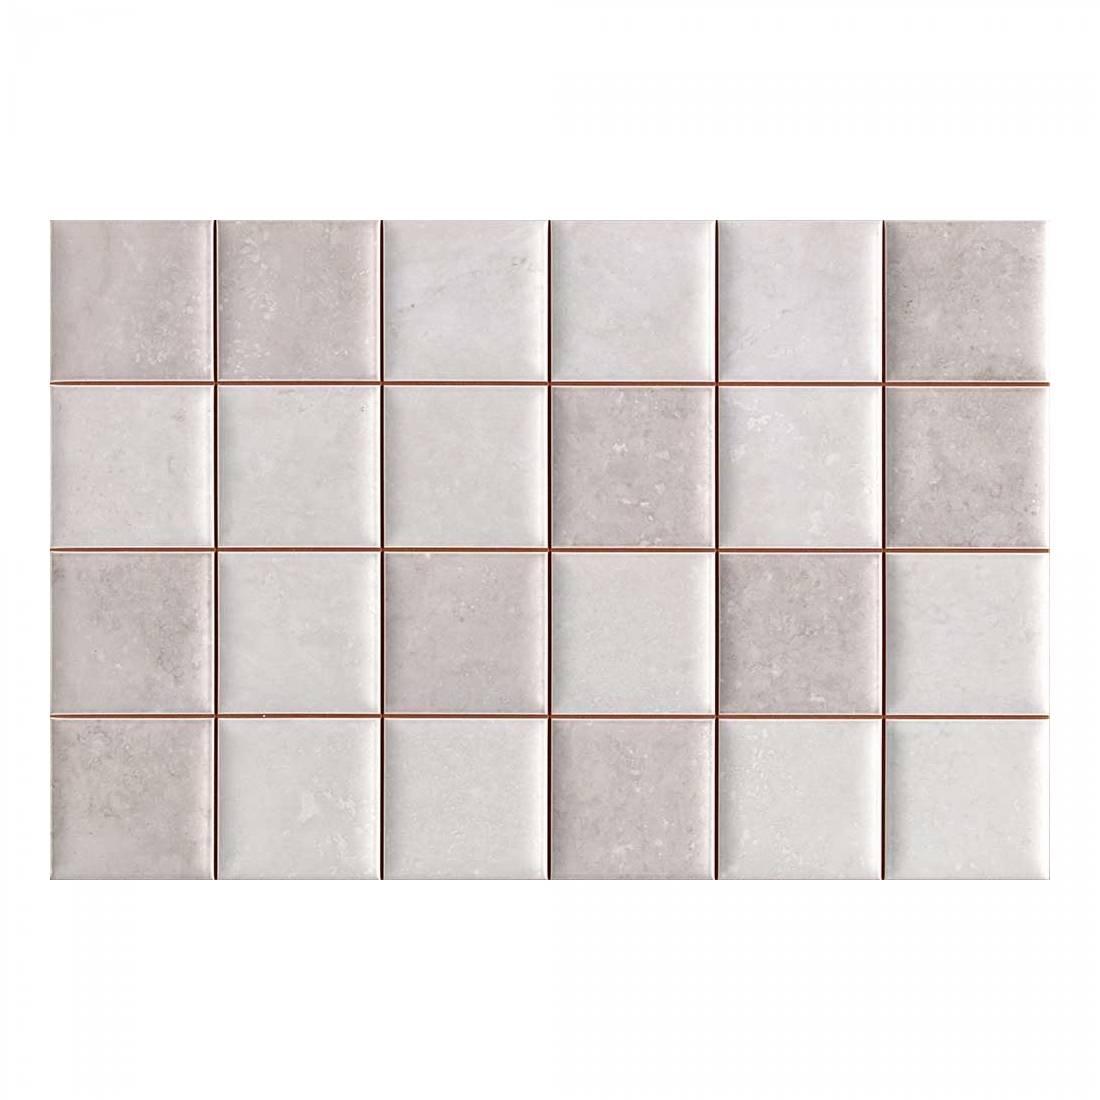 Fez Block 31.6x48 Cendra 1